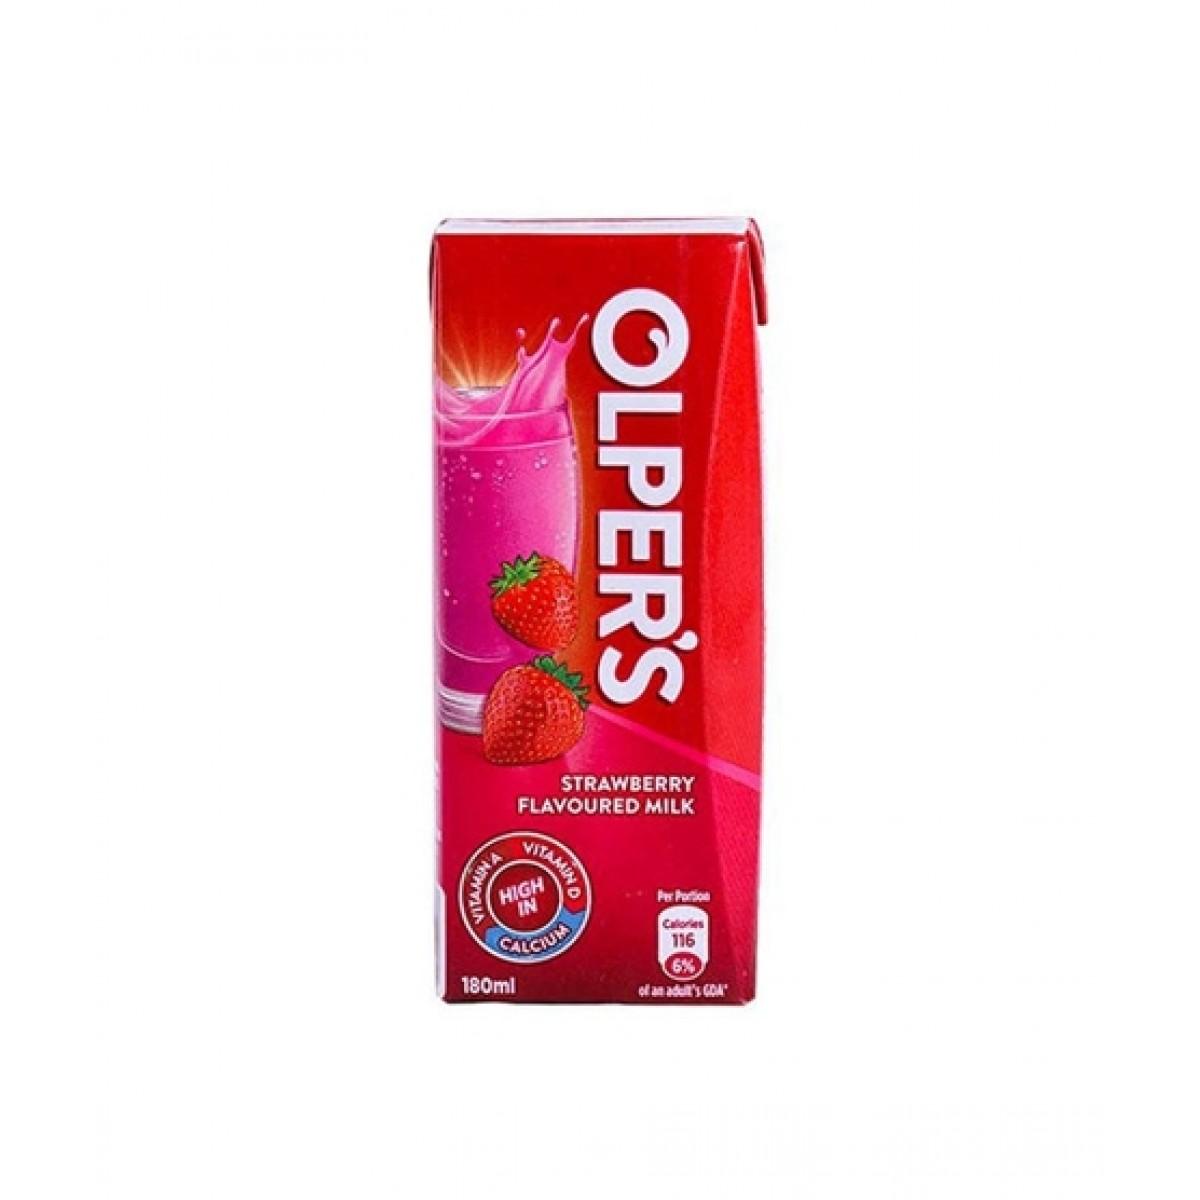 Olpers Strawberry Flavored Milk 180ml